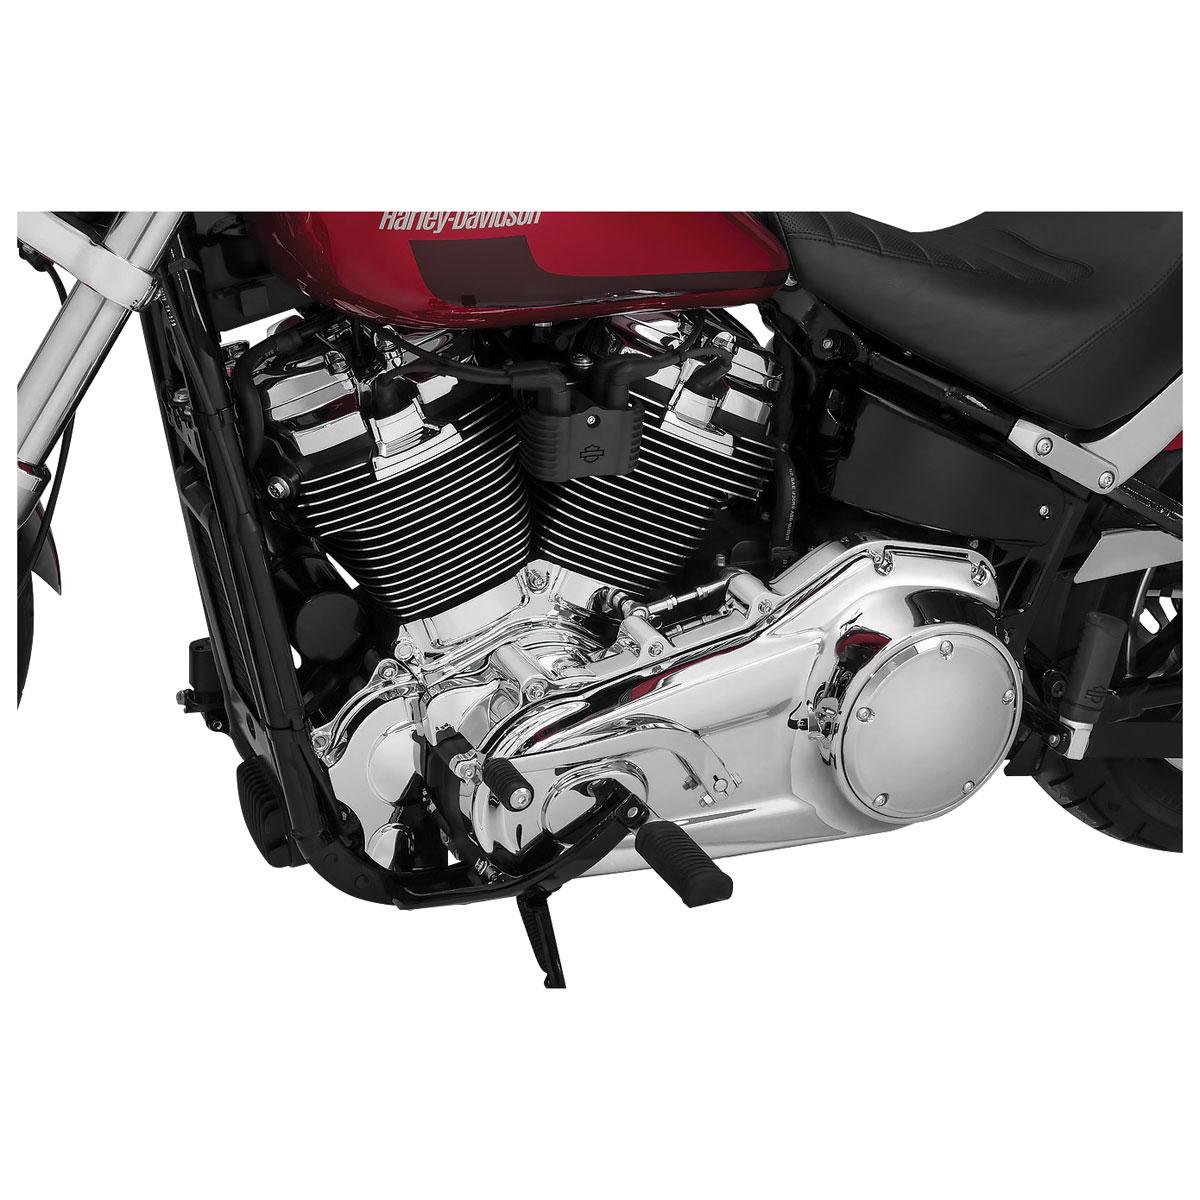 Kuryakyn 6452 Chrome Precision Cylinder Base Cover 2018-2019 Harley Softail